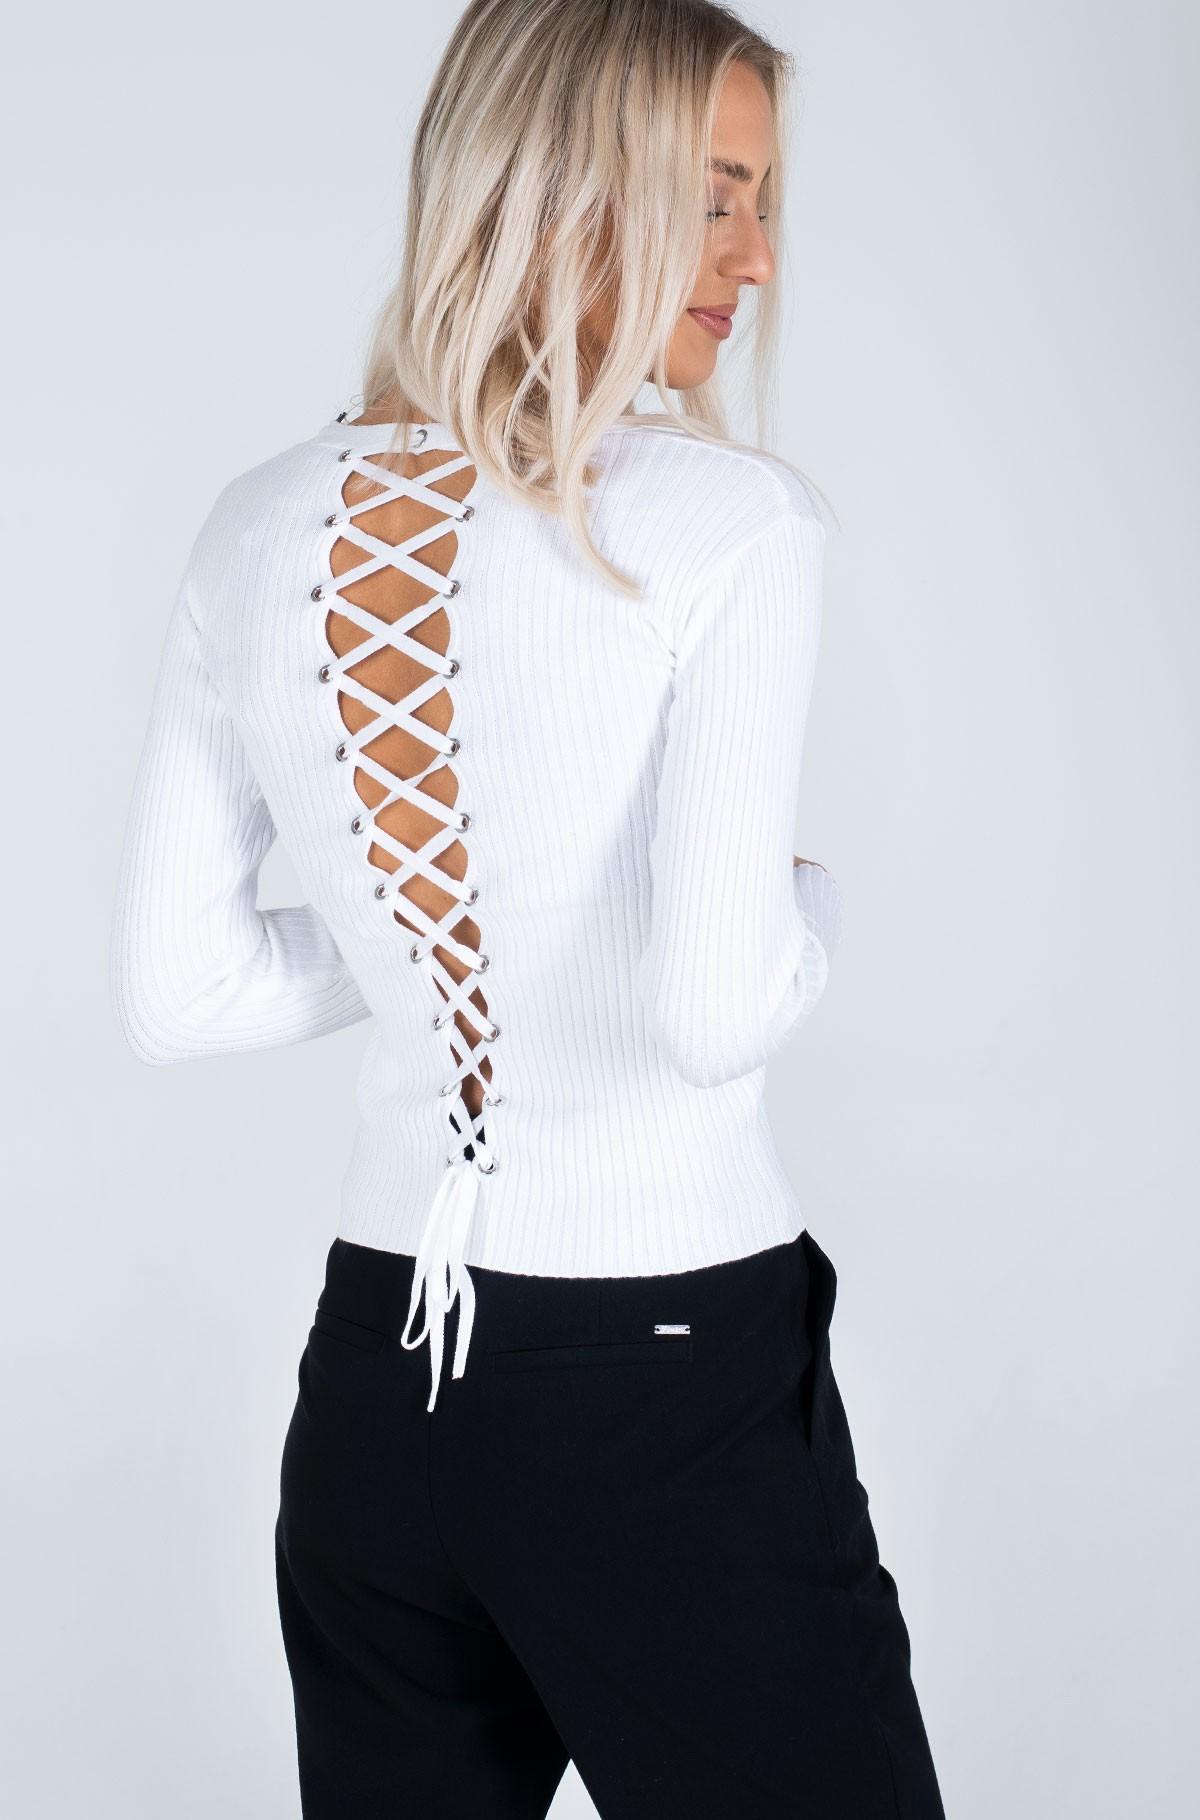 Sweater W01R0N Z2M60-full-1